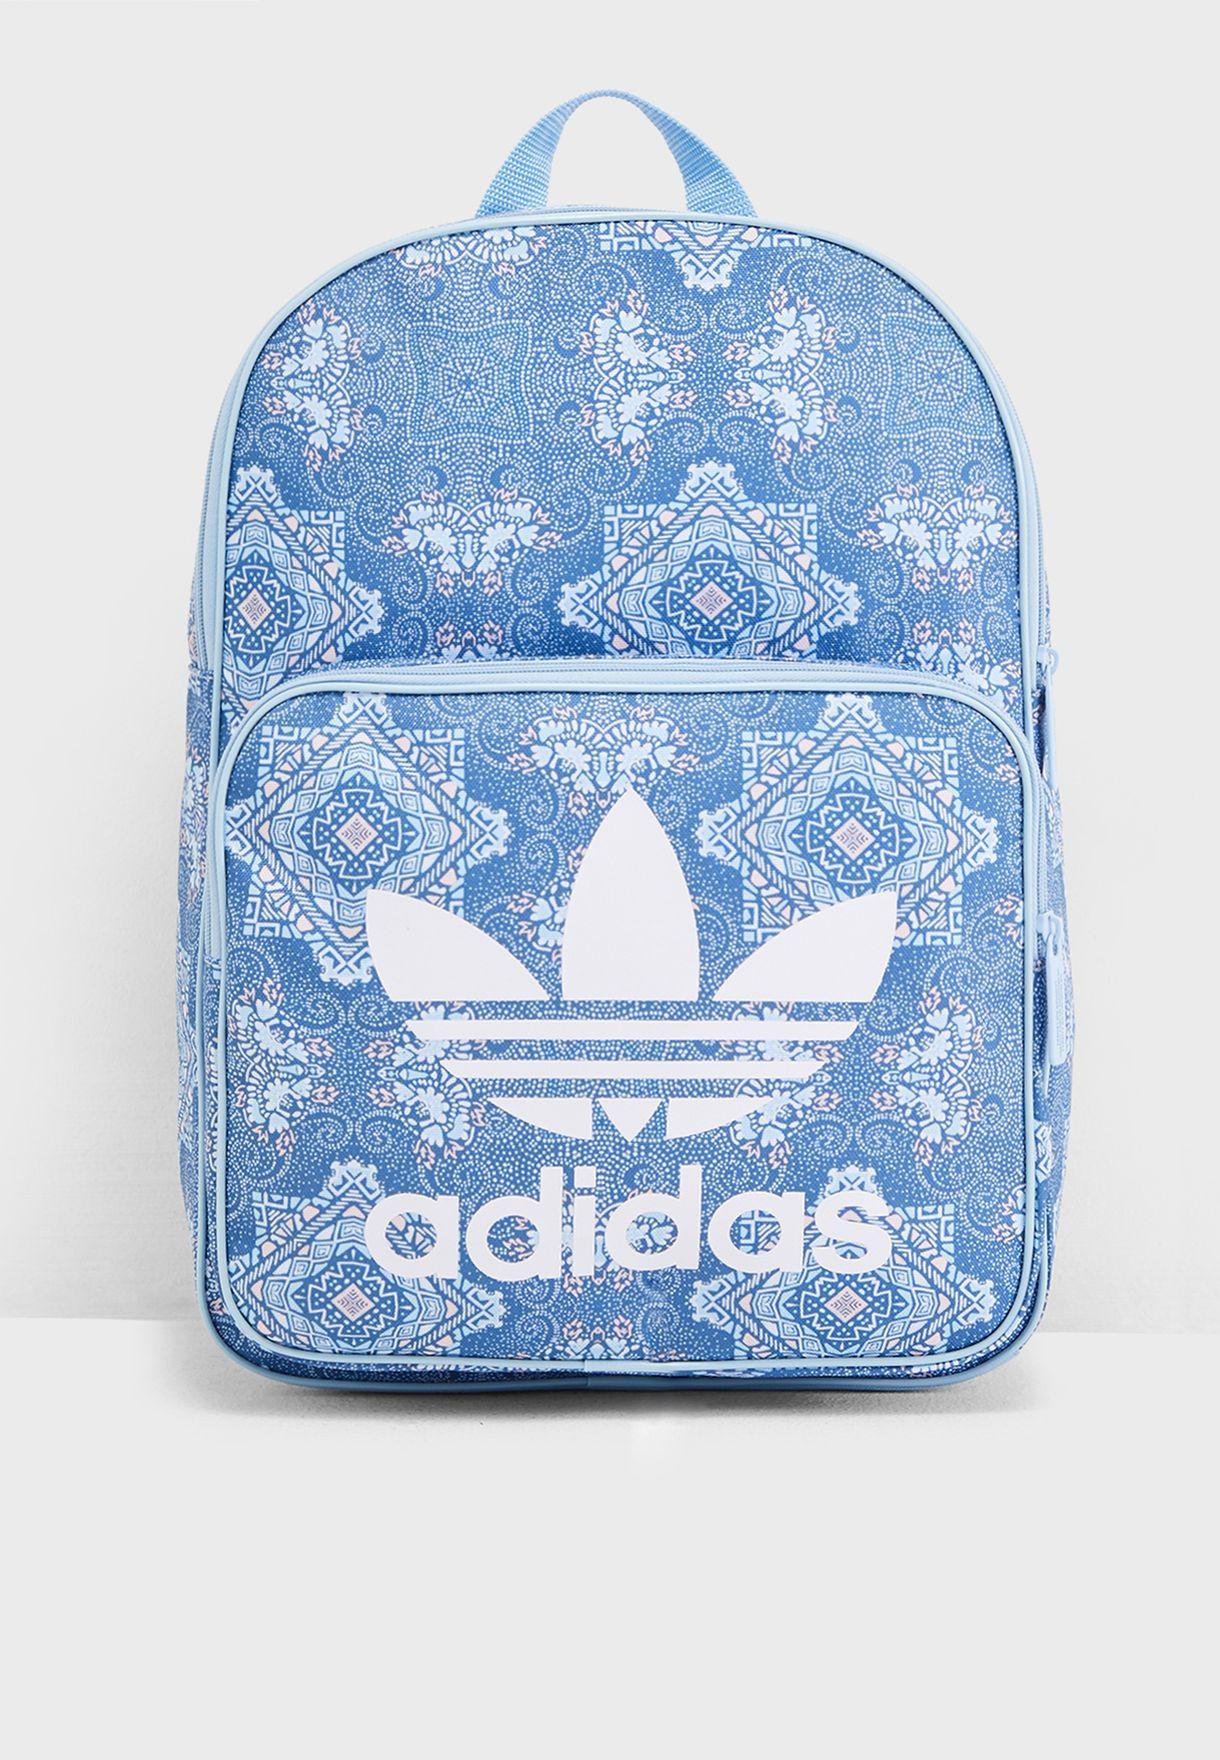 5d6075312b Shop adidas Originals blue Trefoil Graphic Backpack DU7736 for Women in  Bahrain - 14448AC20XDP